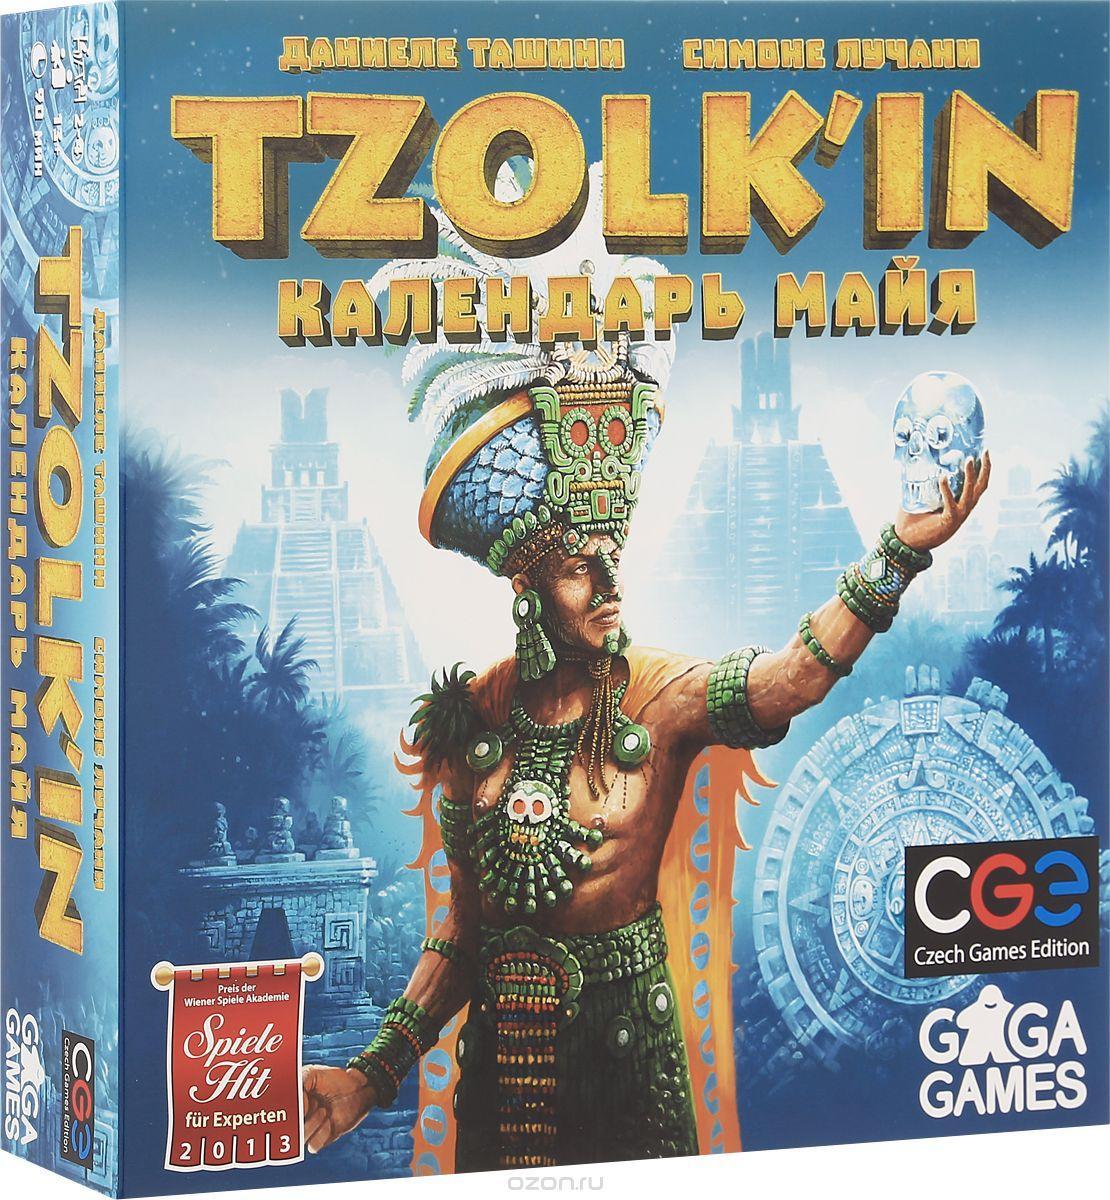 Настольная игра Tzolk'in: The Mayan Calendar (Цолькин. Календарь майя)